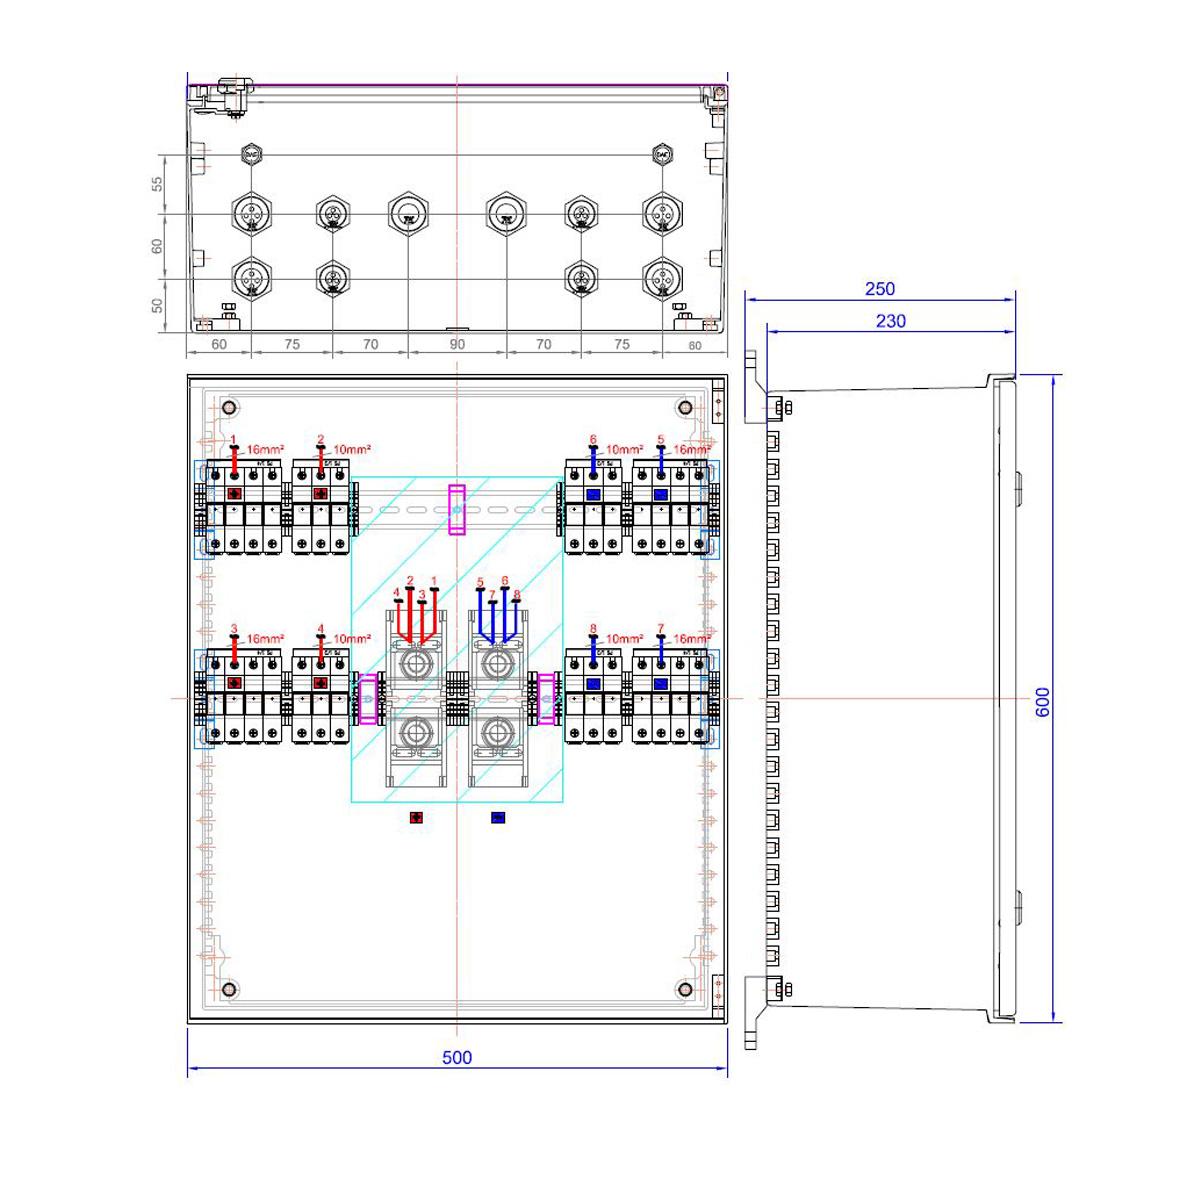 System-Image